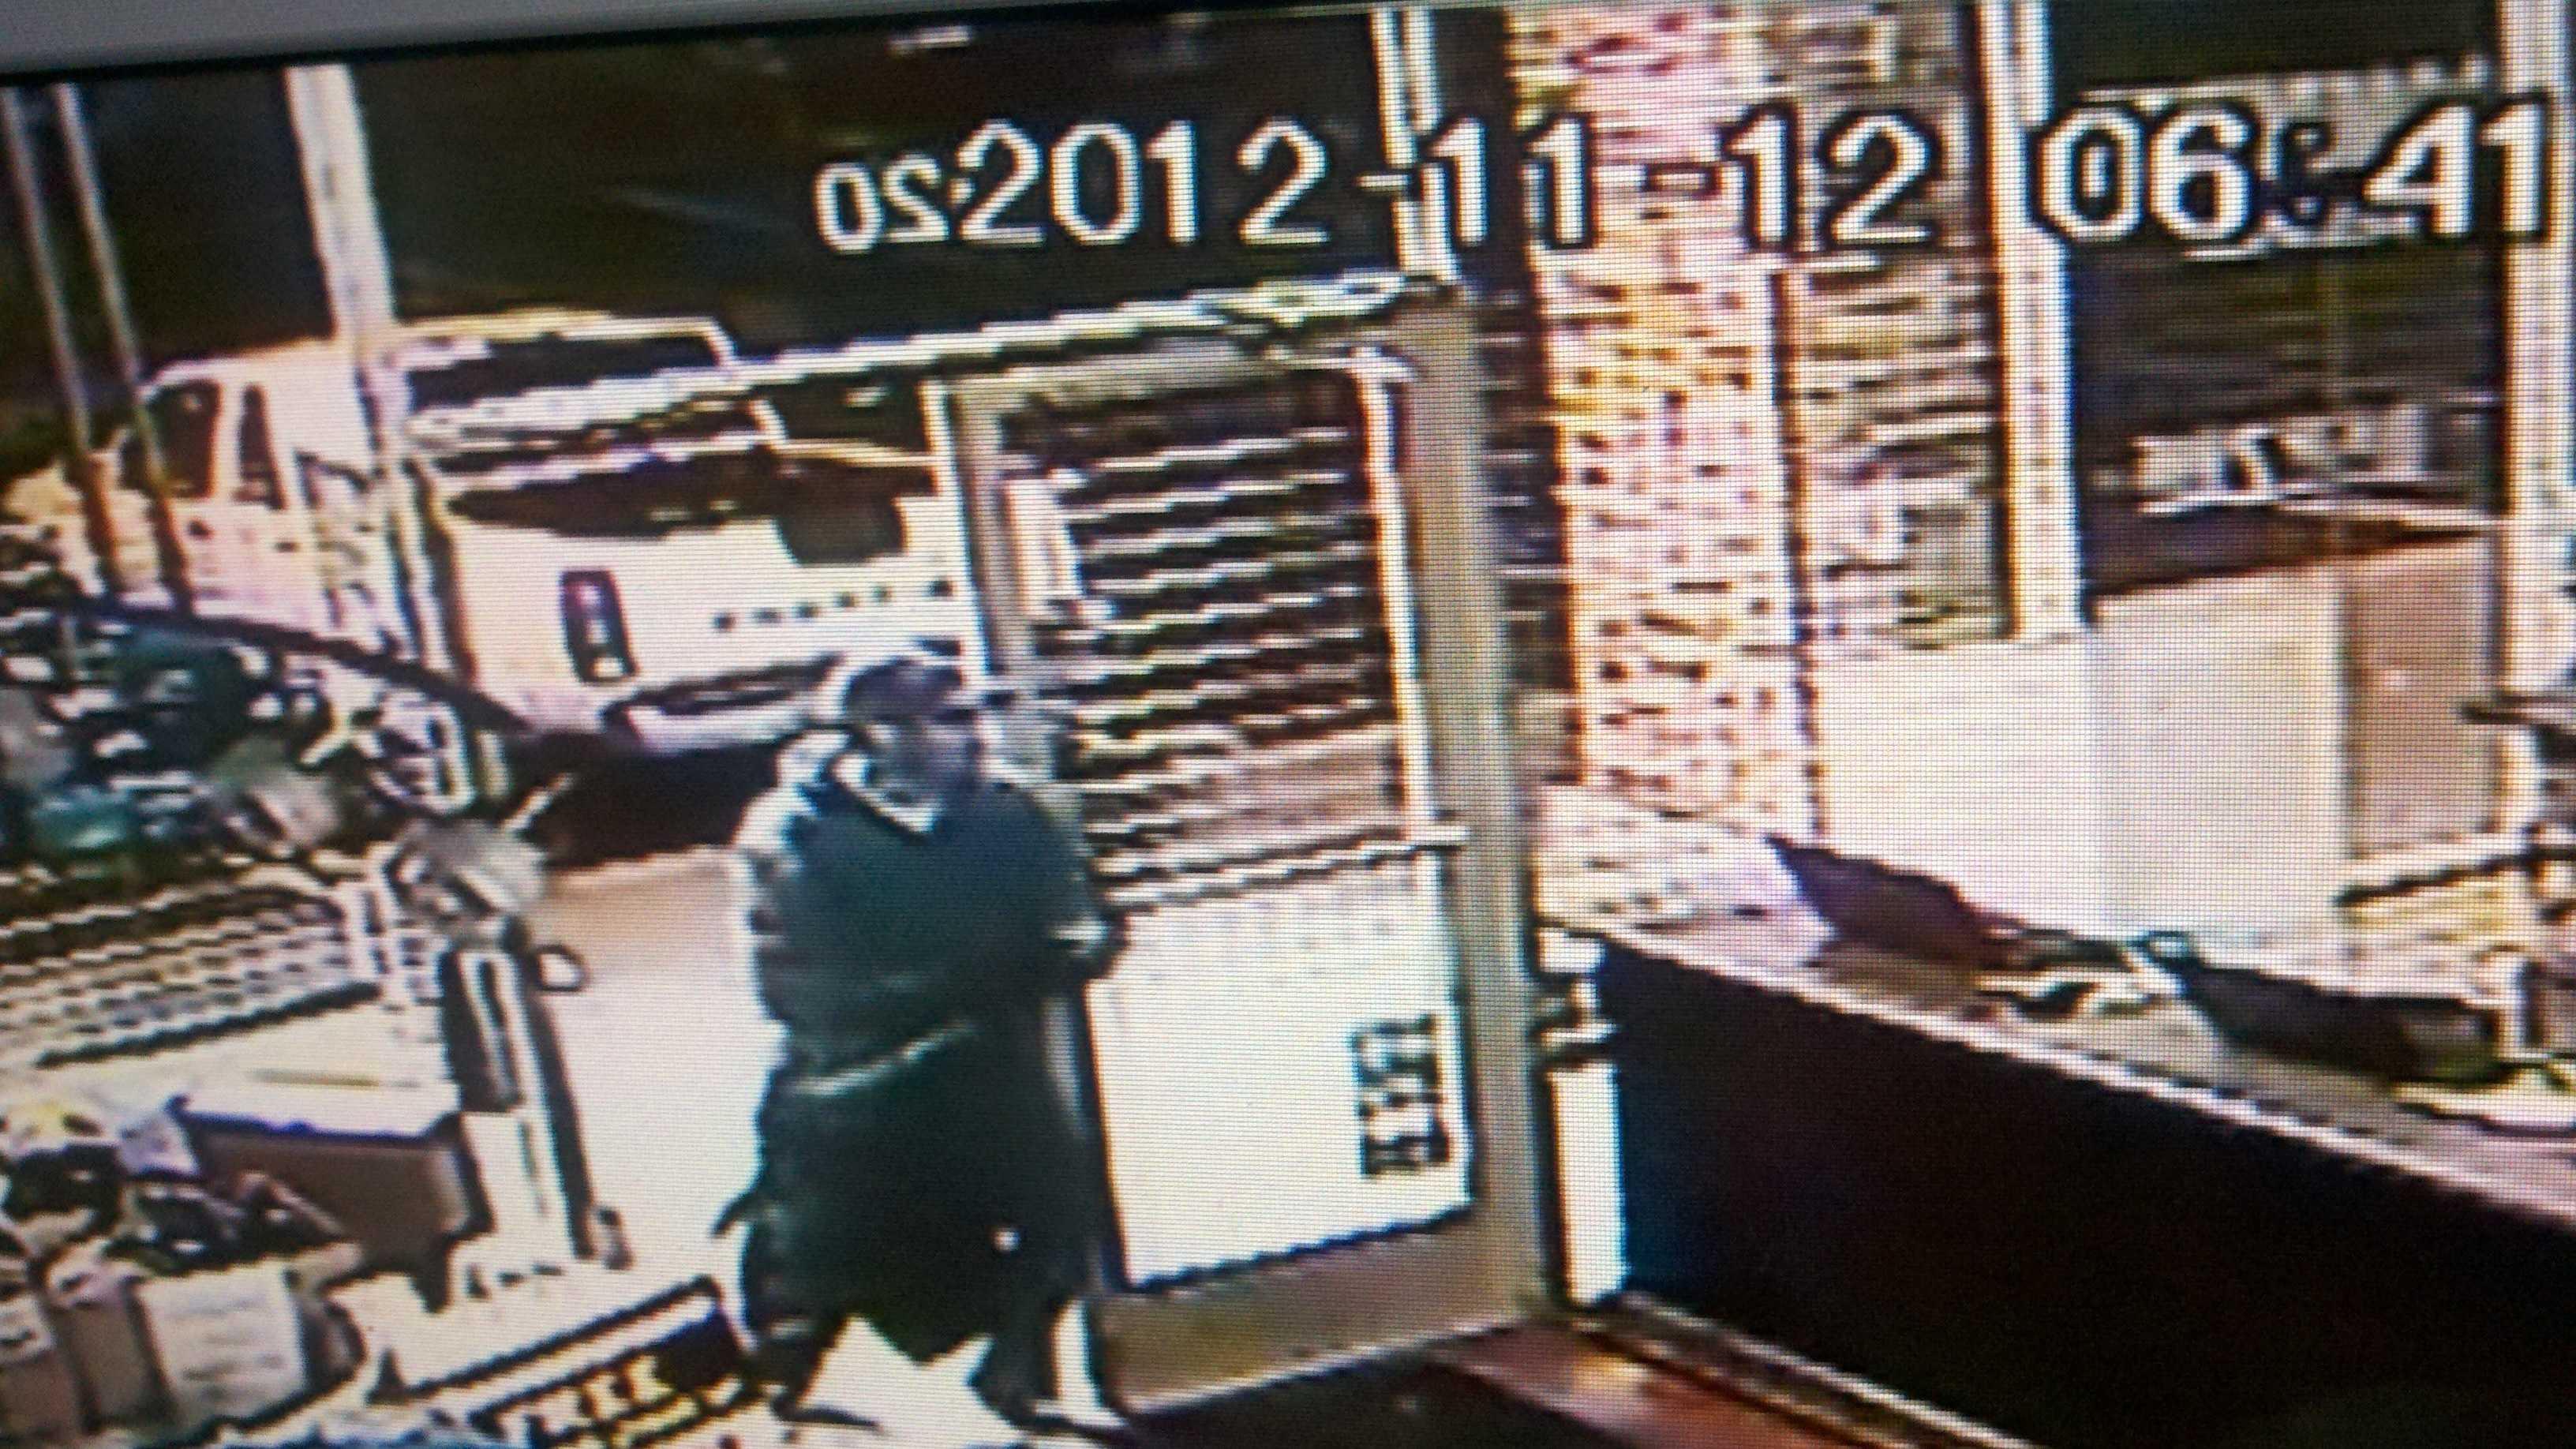 Laptop thief caught on camera